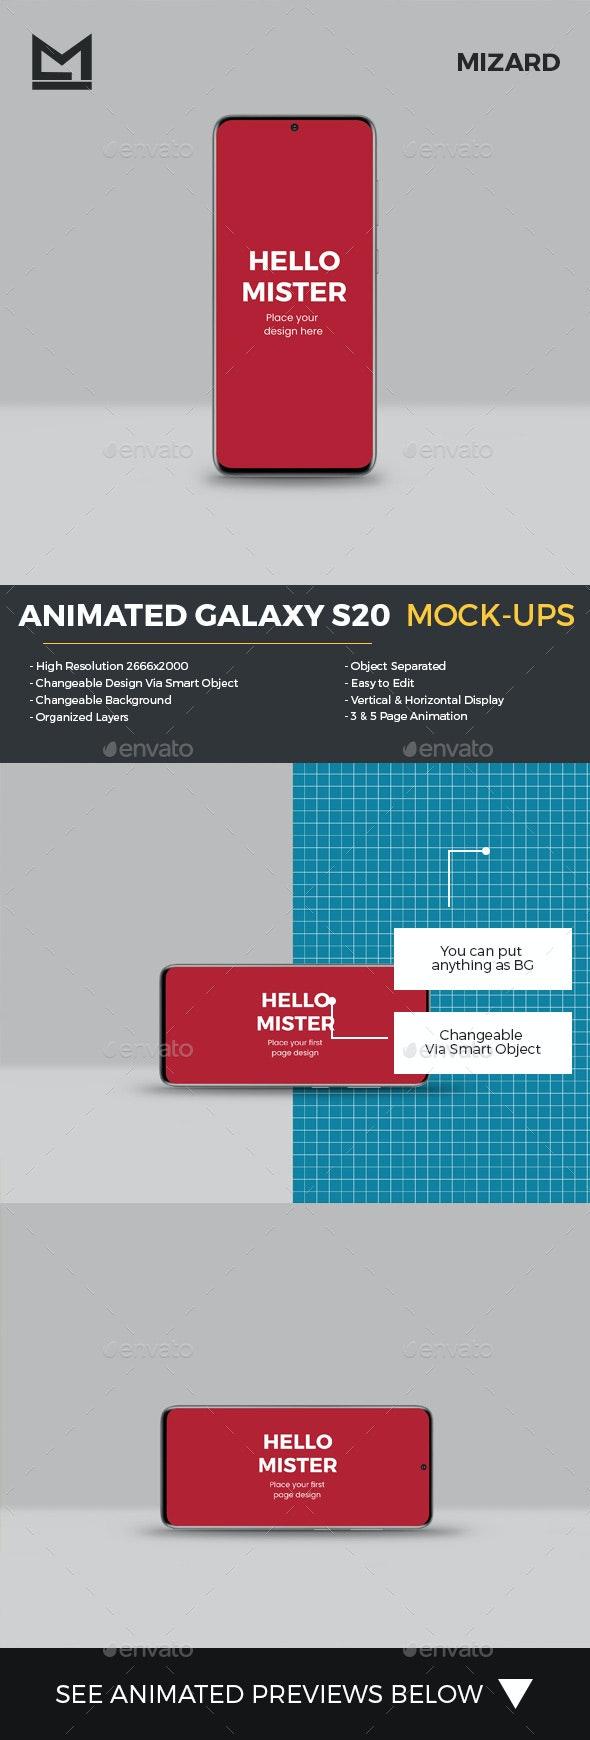 Animated Galaxy S20 Mockup - Mobile Displays